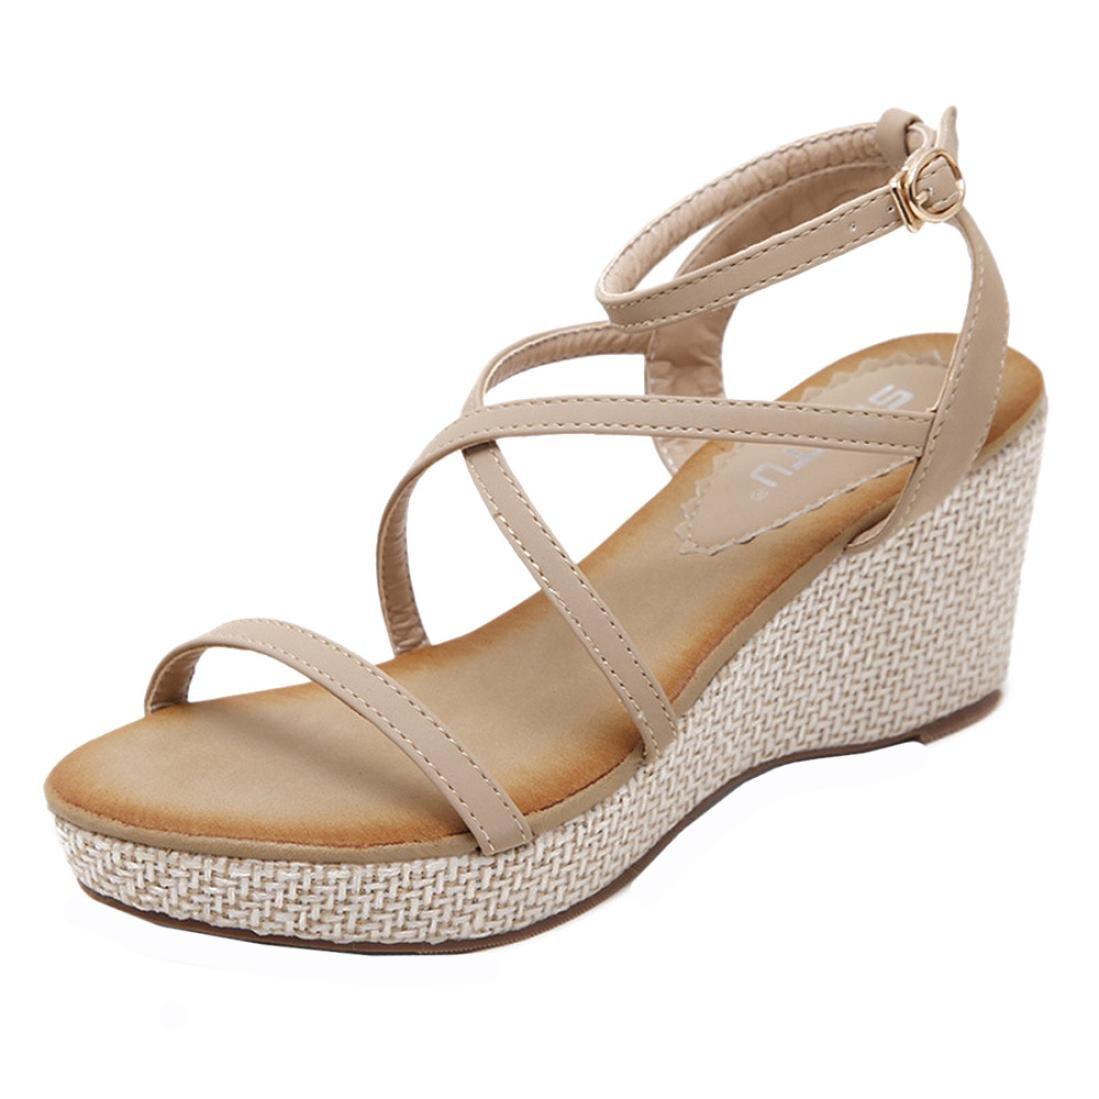 Aurorax-Shoes Womens Wedges Dress Sandals Ankle Strap Bandage Peep Toe Platform Summer Shoes Clearance Sale (Khaki, 39(US:7))